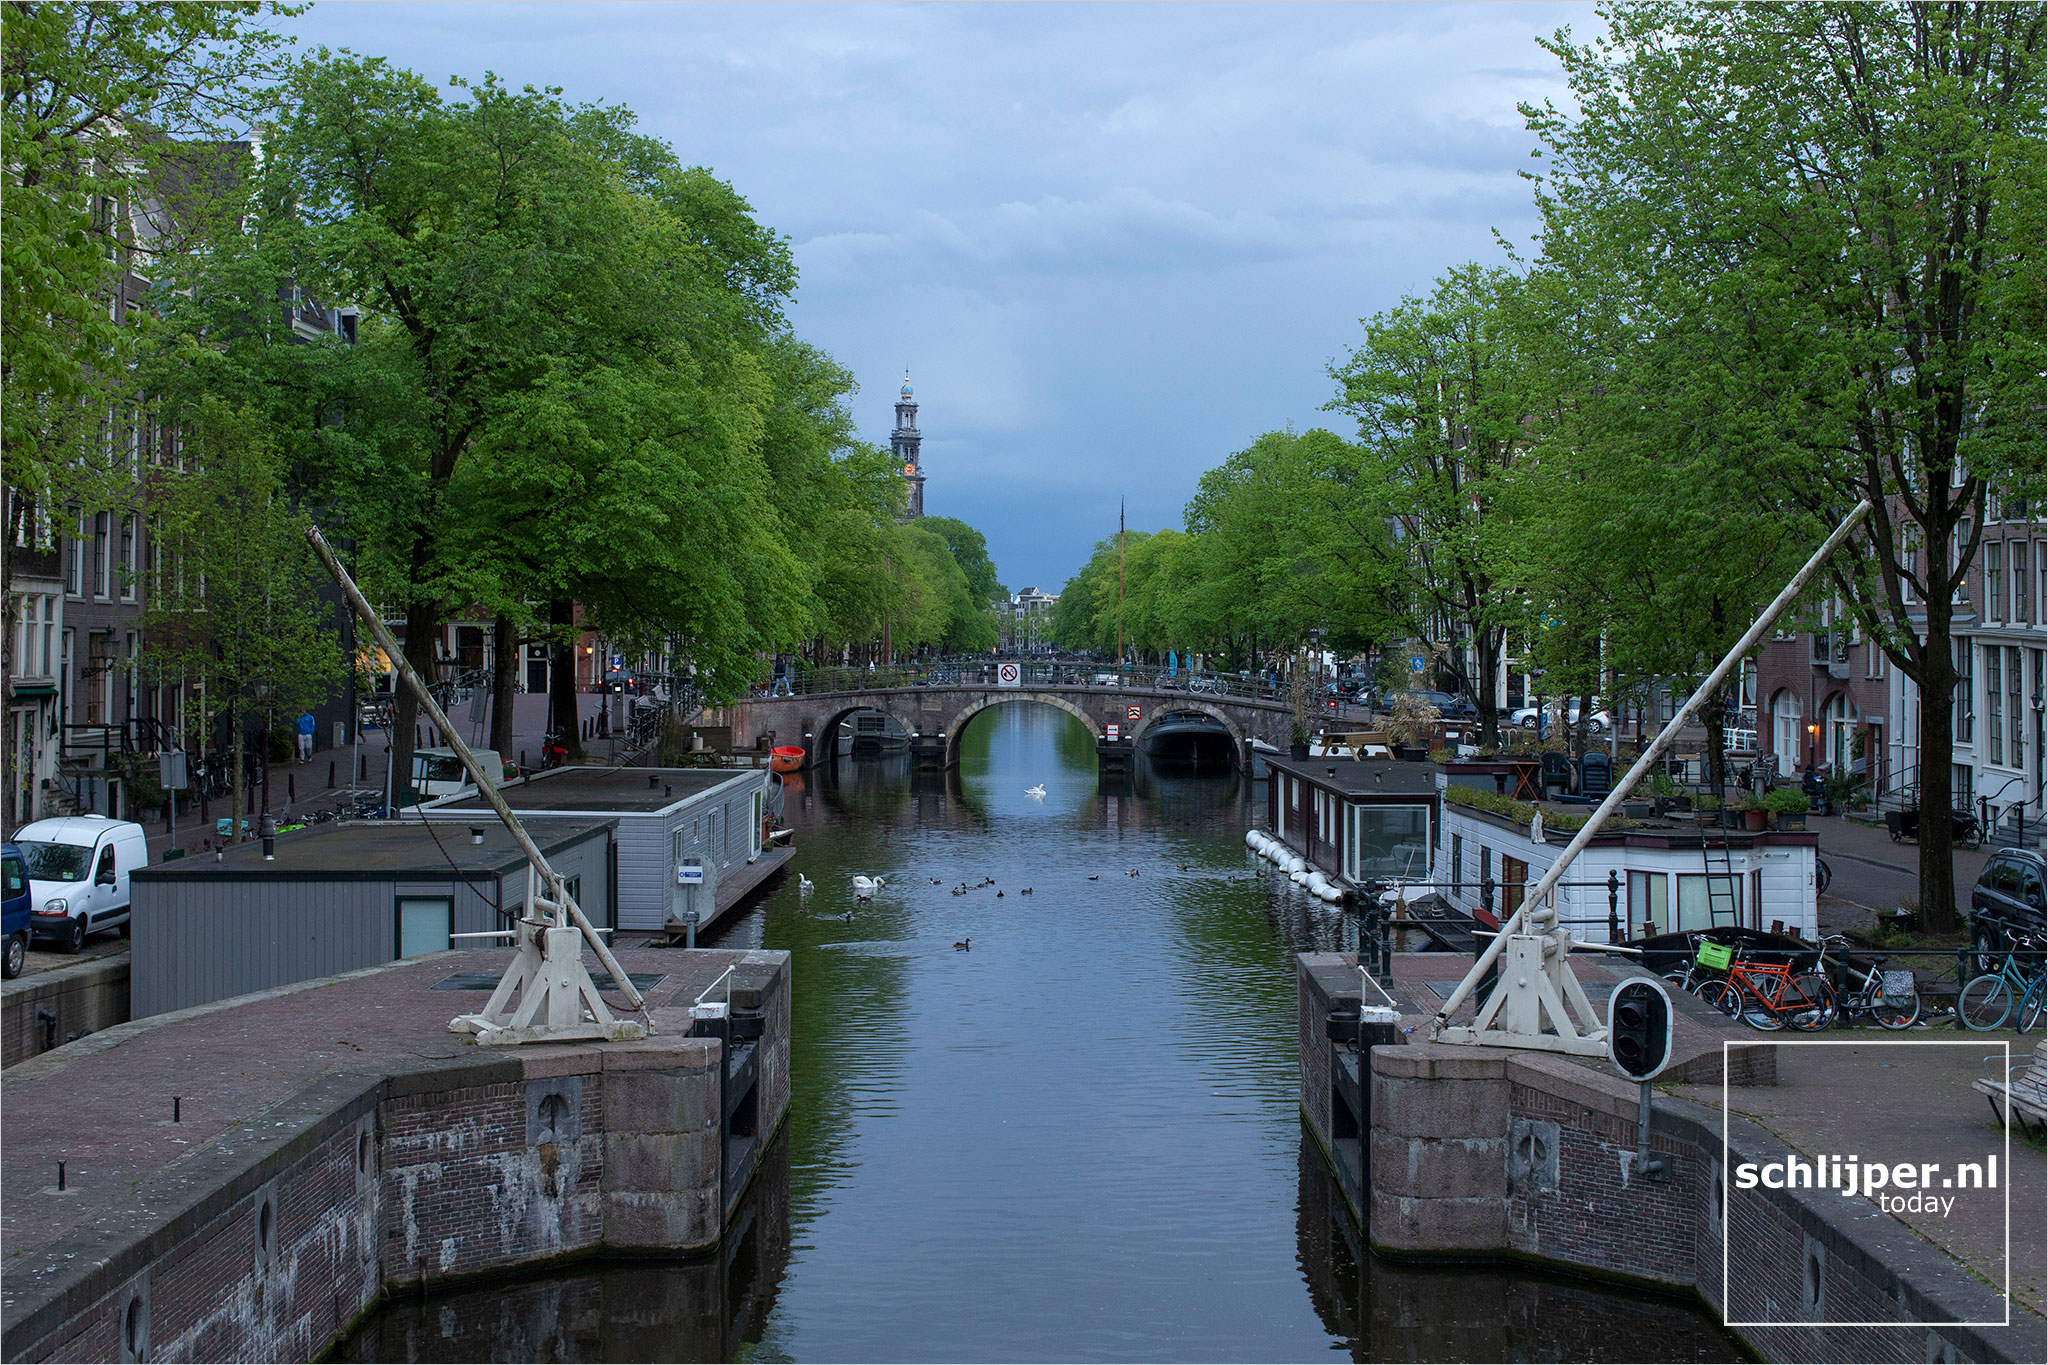 Nederland, Amsterdam, 30 april 2020